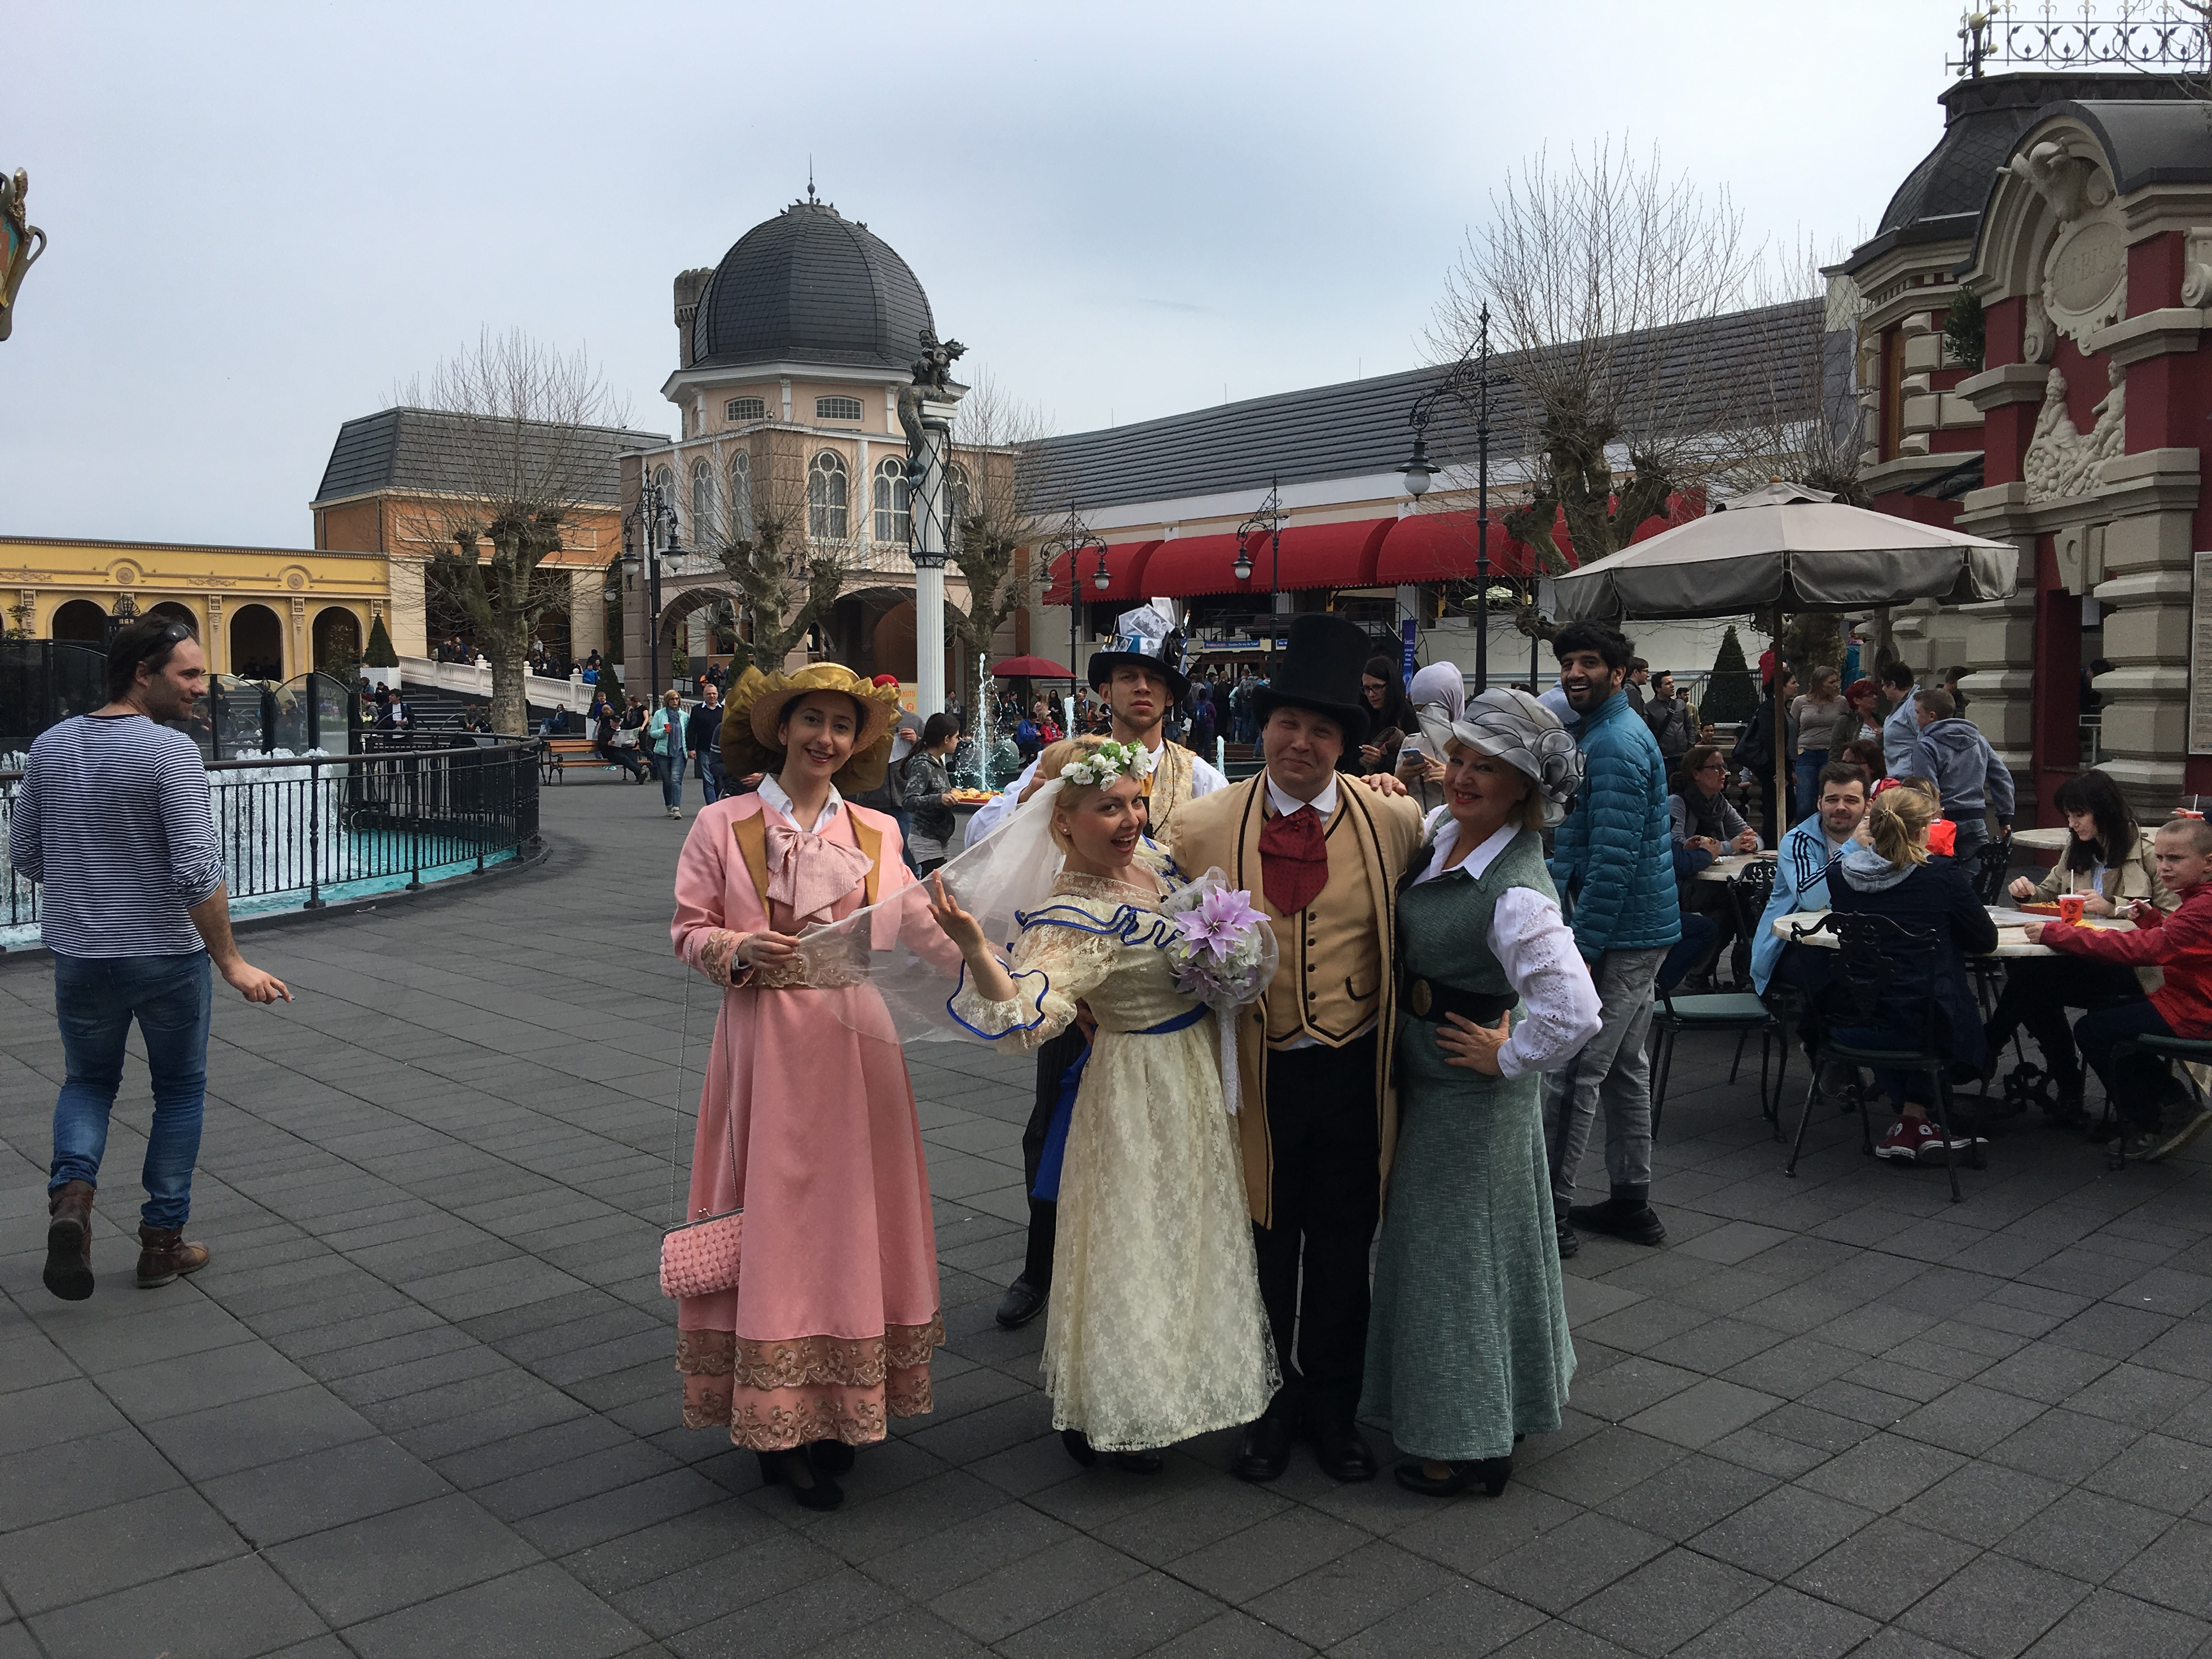 https://www.park-check.de/wp-content/uploads/2017/04/IMG_5980.jpg